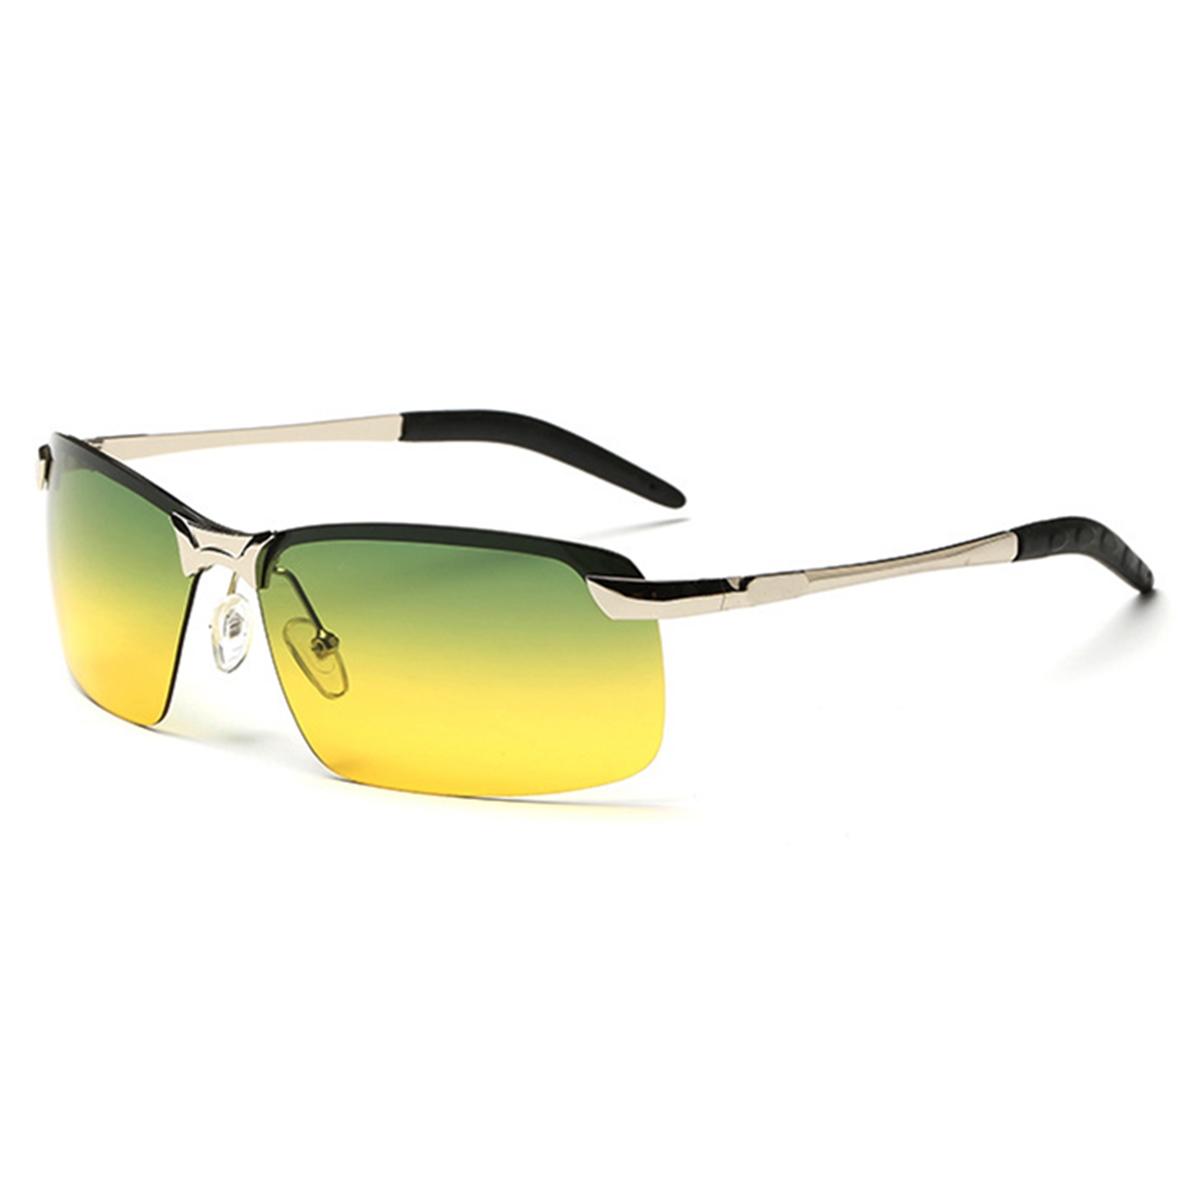 Fashion Day Night Vision Polarized Sunglasses Driving Glasses Eyewear UV400